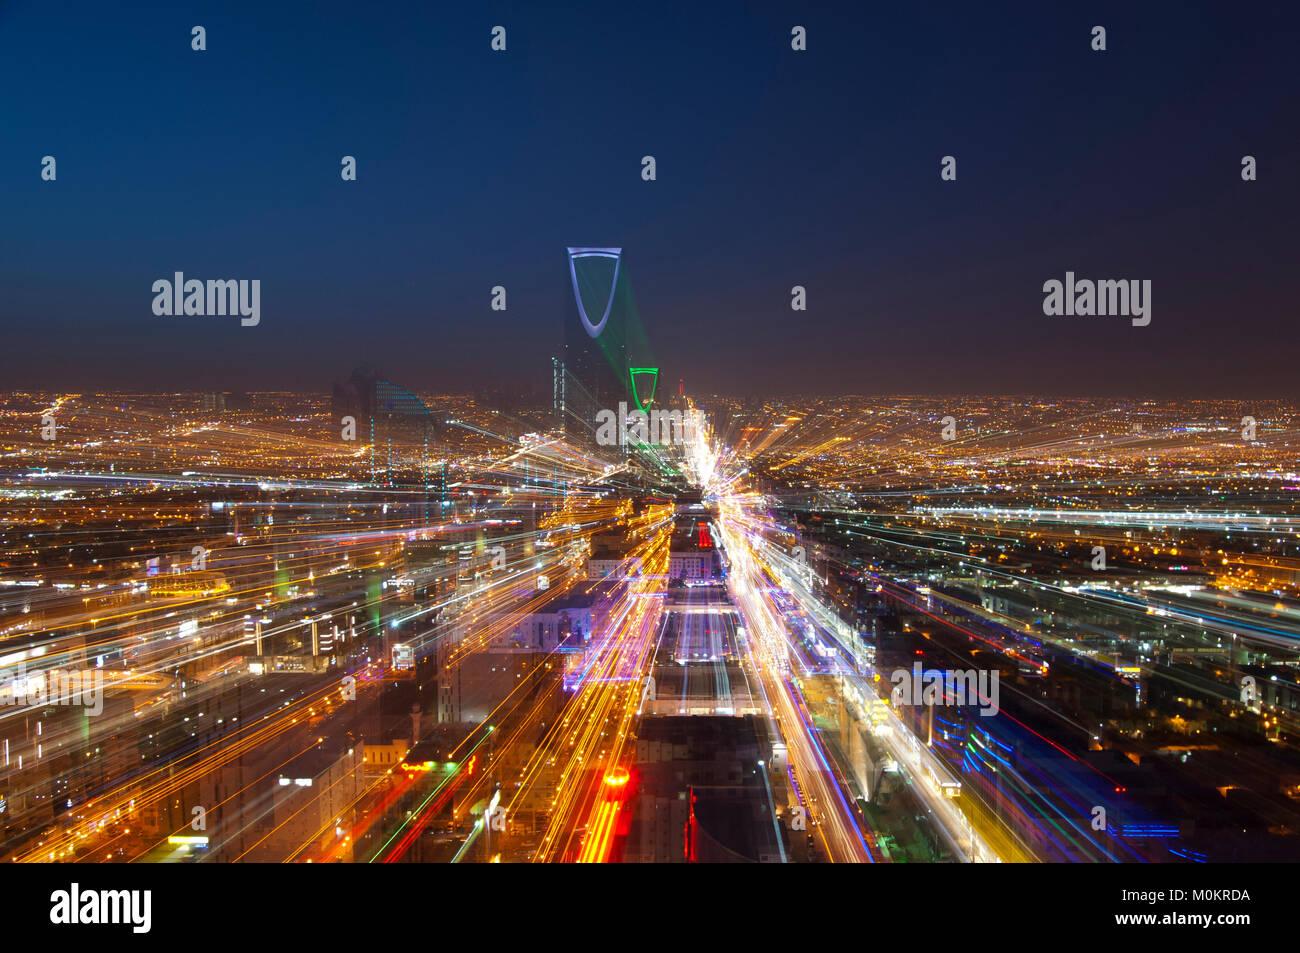 Riyadh skyline at night #5 Photo Stock